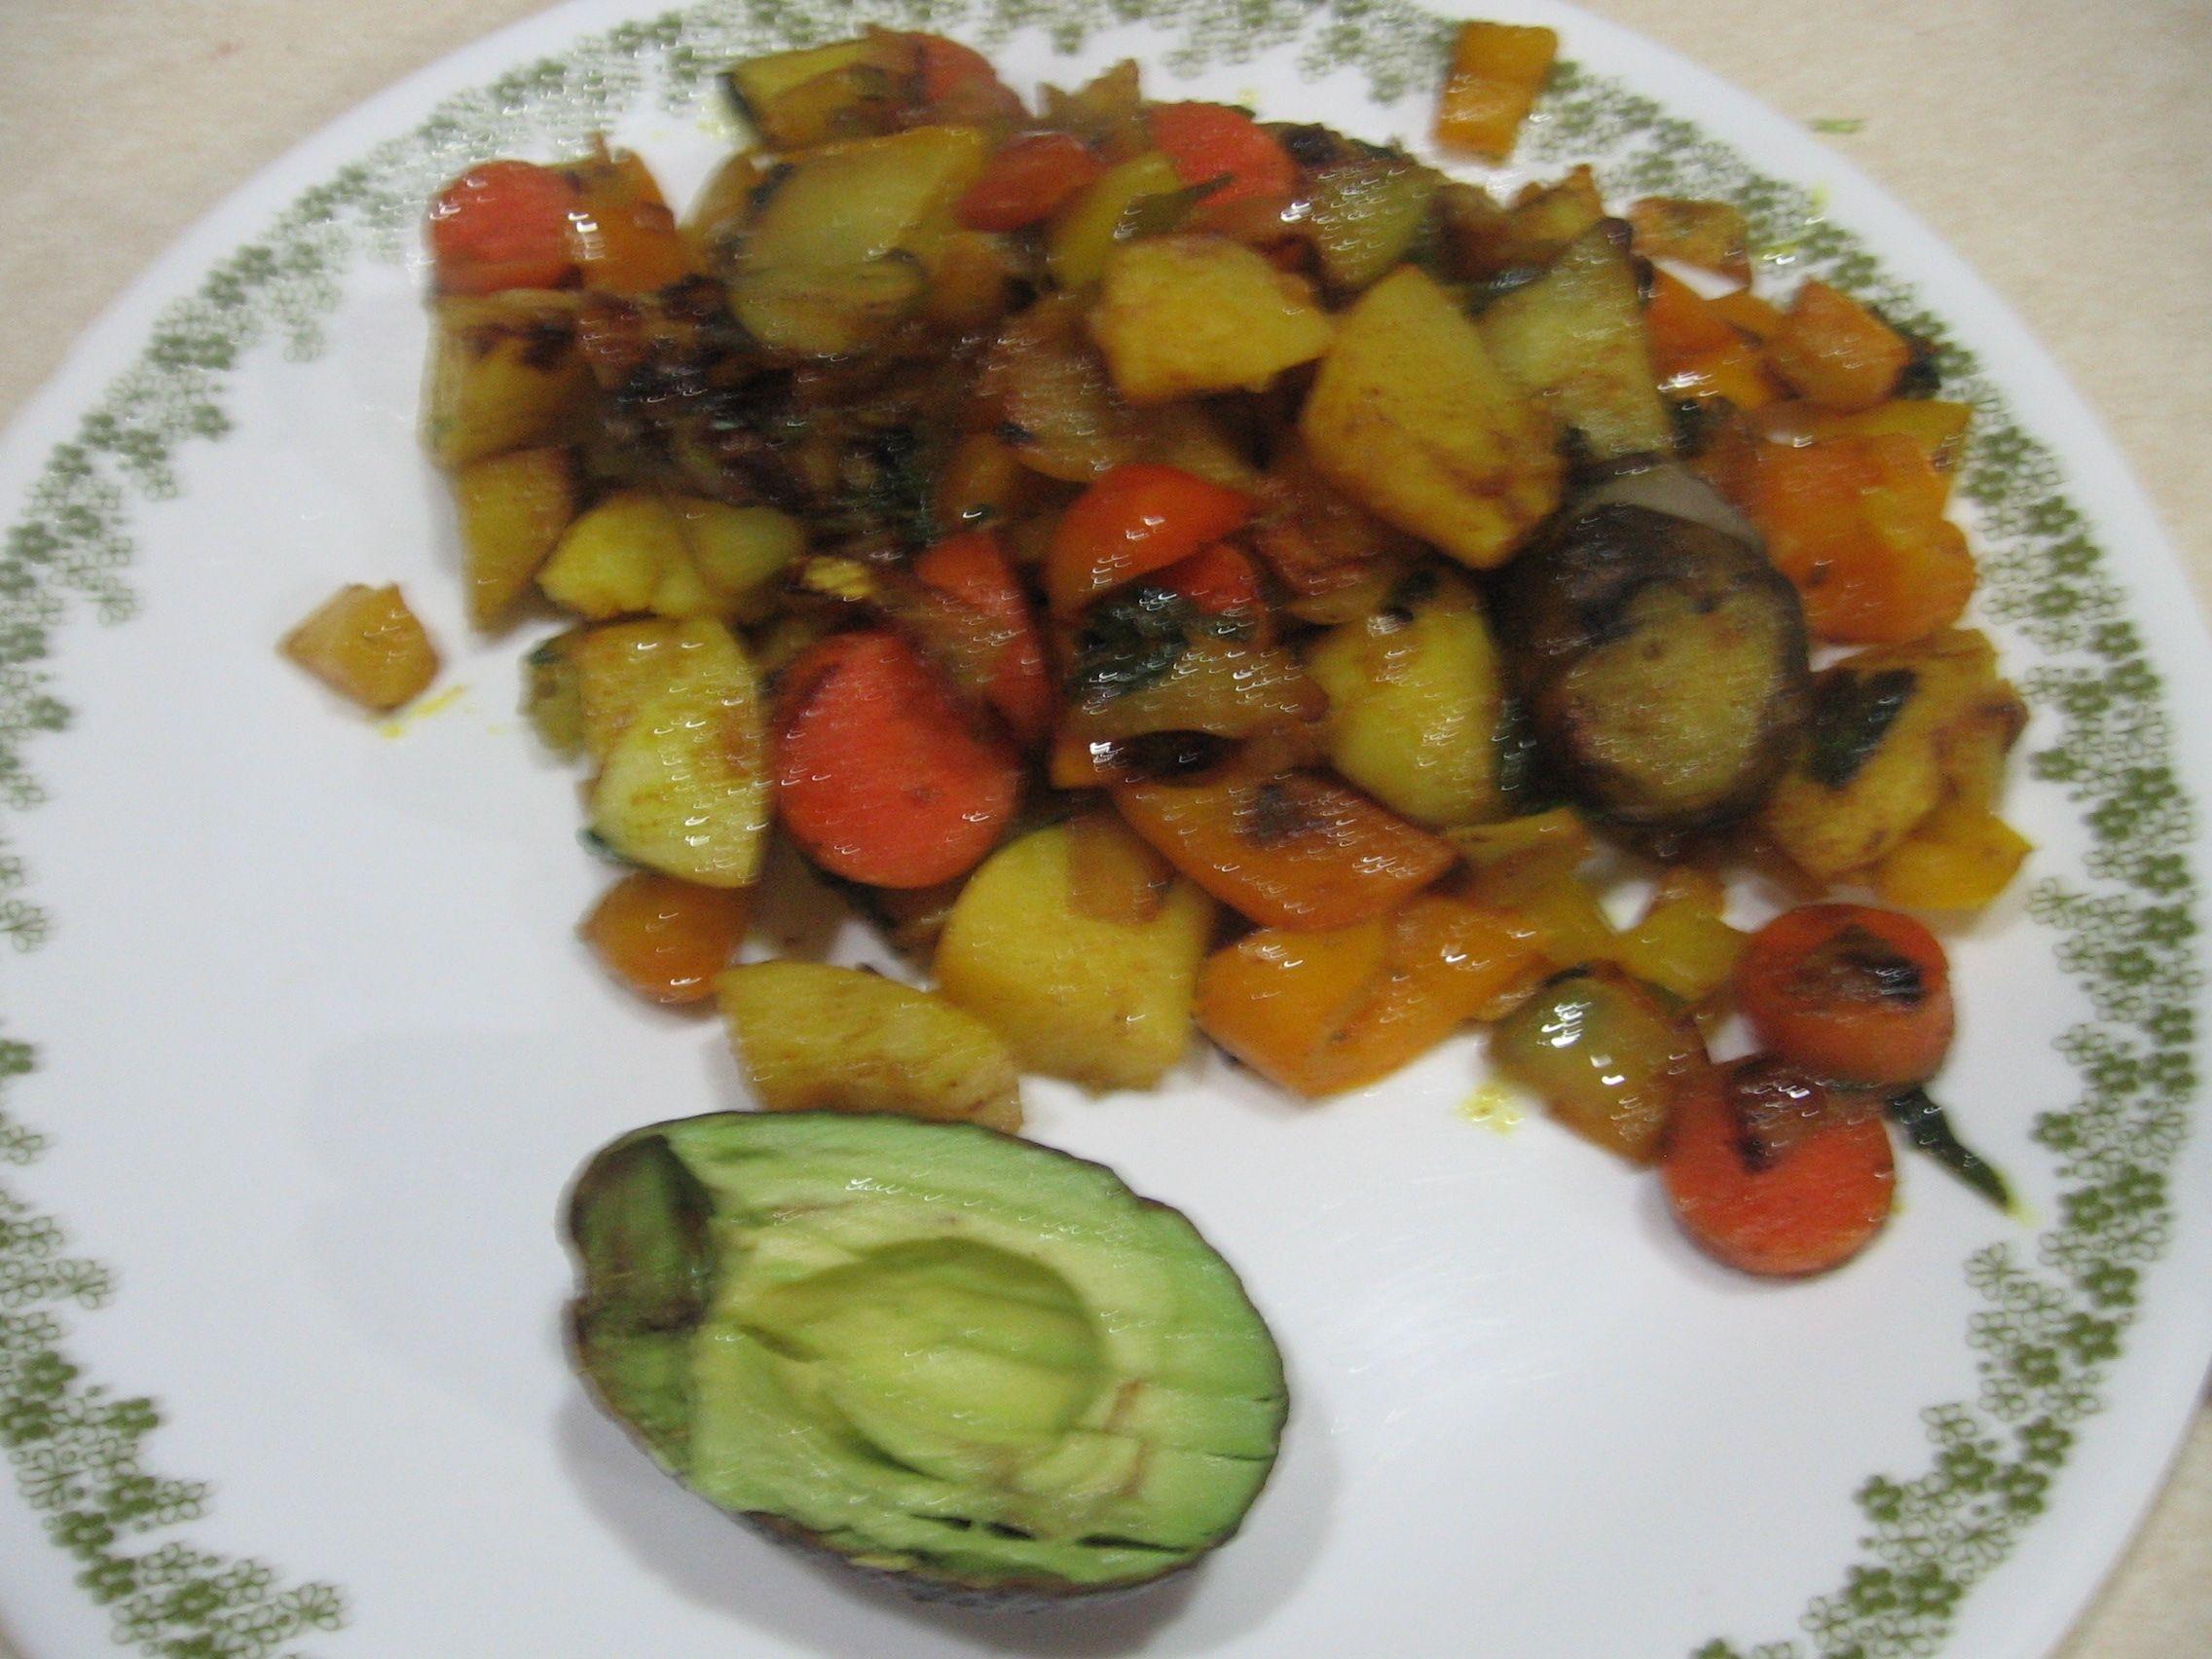 2310 Scored & pitted #avocado & #rootvegetable stew - #jerusalemArtichoke #yellowpotatoes #carrots #turnips #rhutabega #onions and #yellowbellpepper